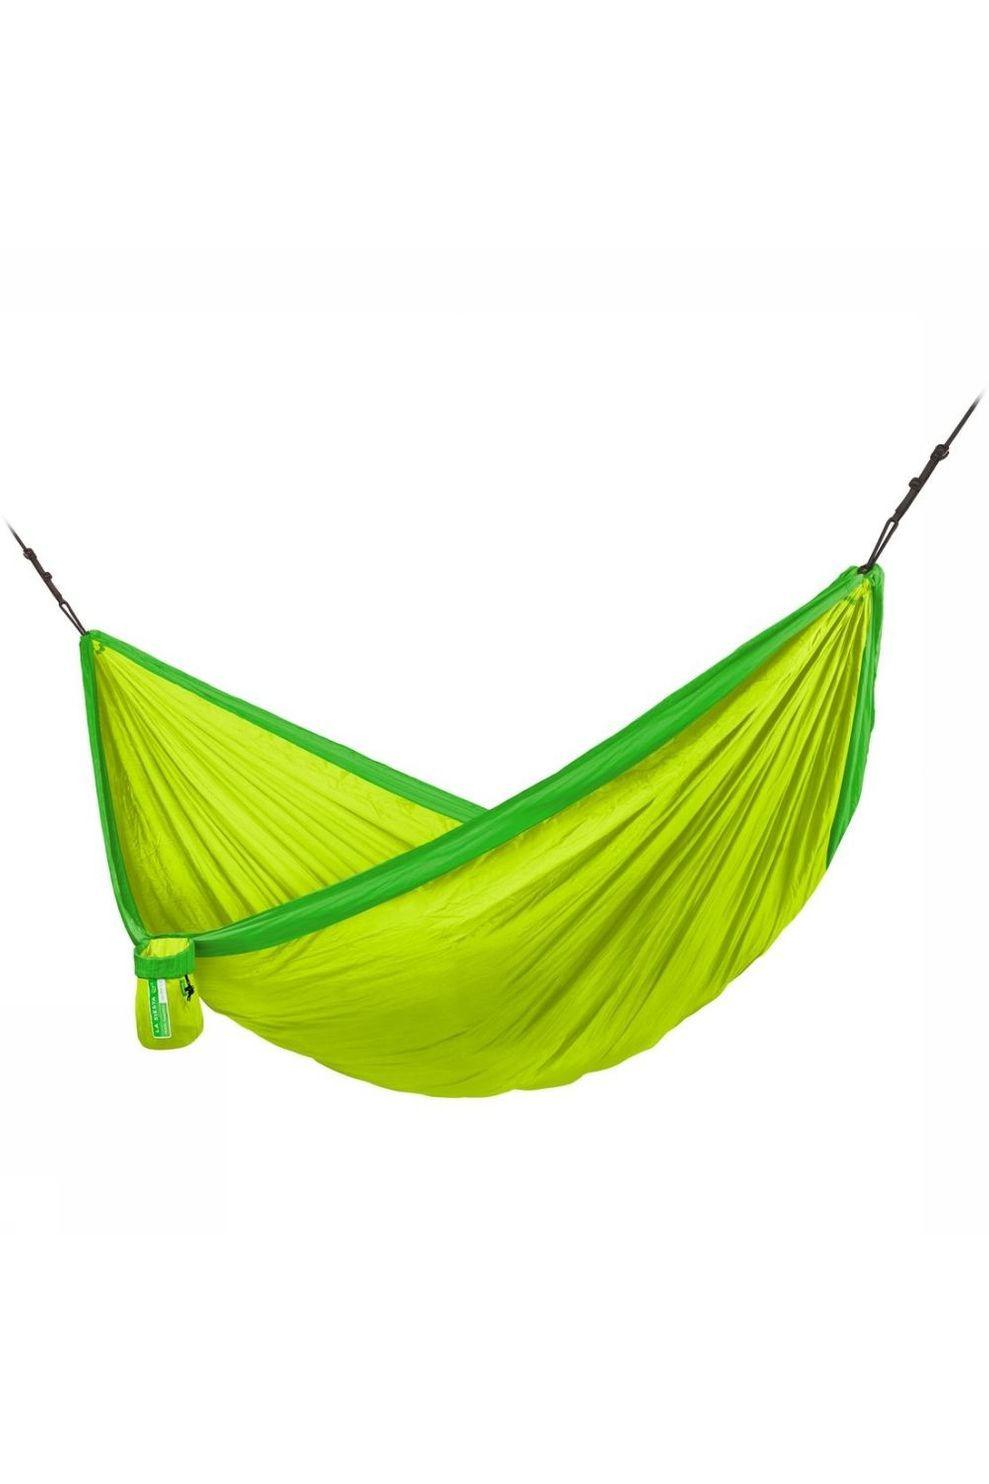 La Siesta Hangmat Colibri 3.0 Single - Limoen Groen